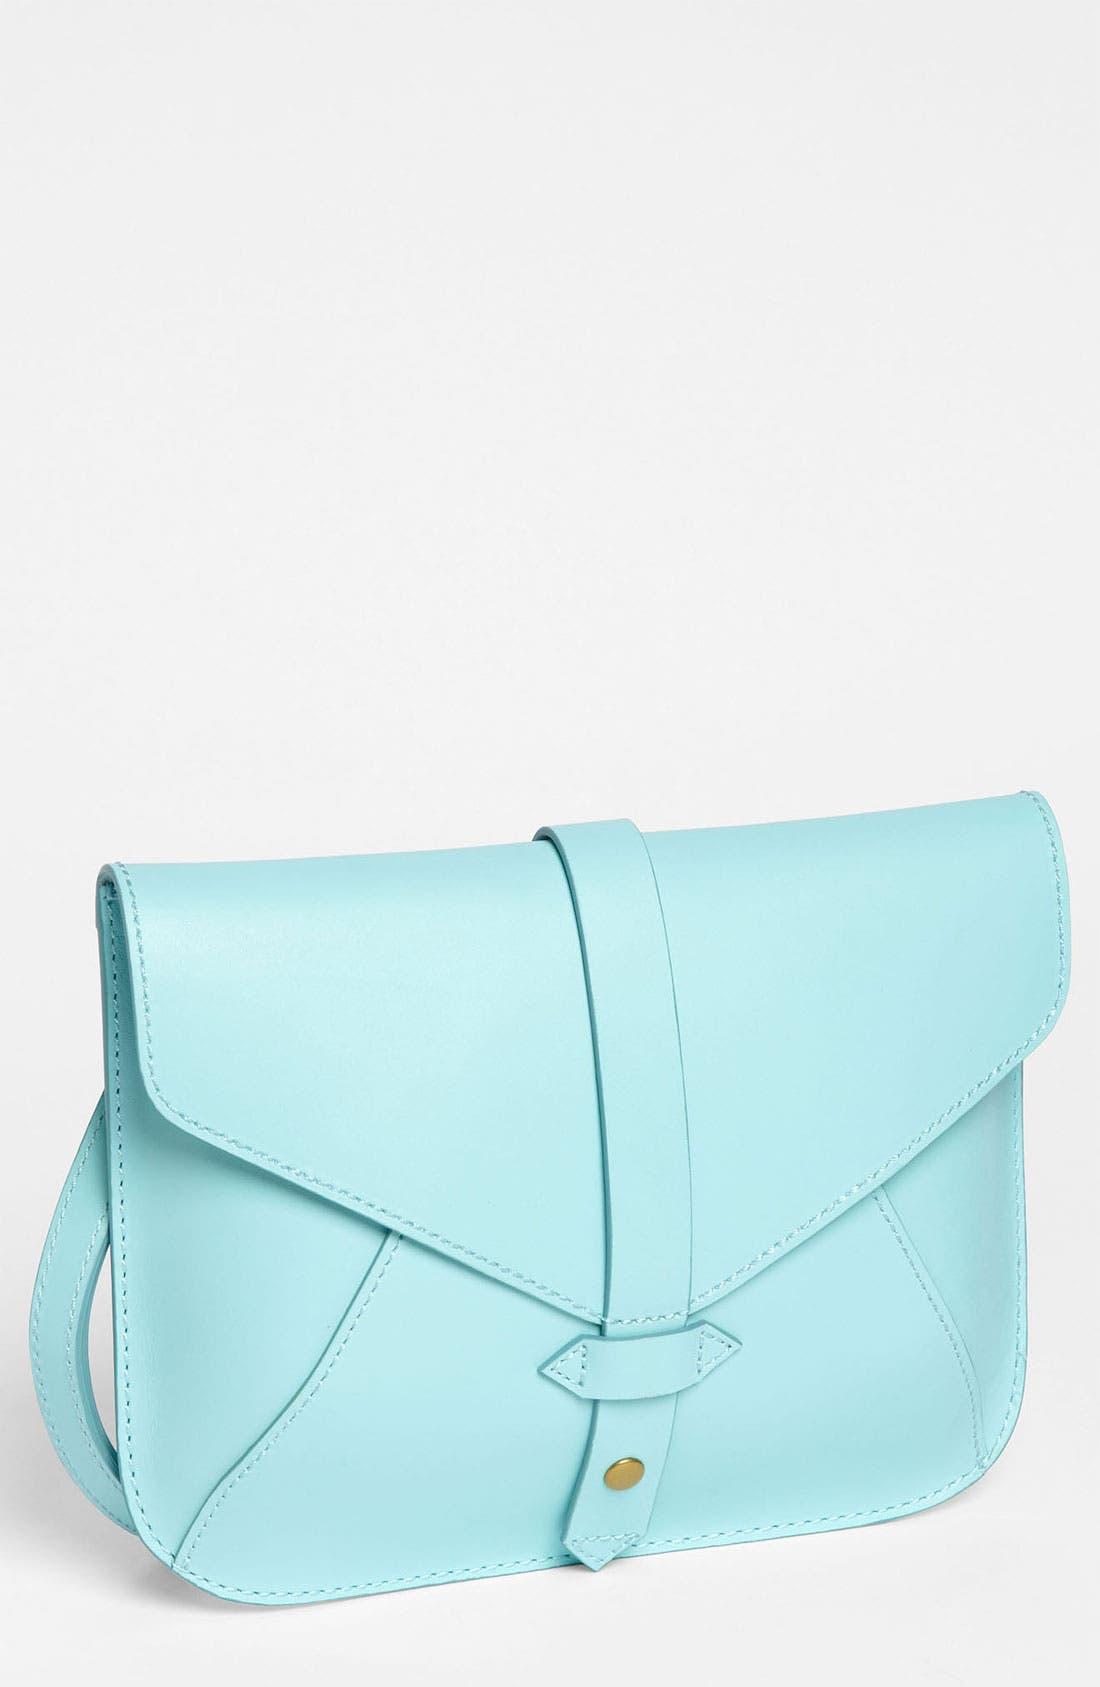 Alternate Image 1 Selected - IIIBeCa by Joy Gryson 'Church Street' Envelope Crossbody Bag